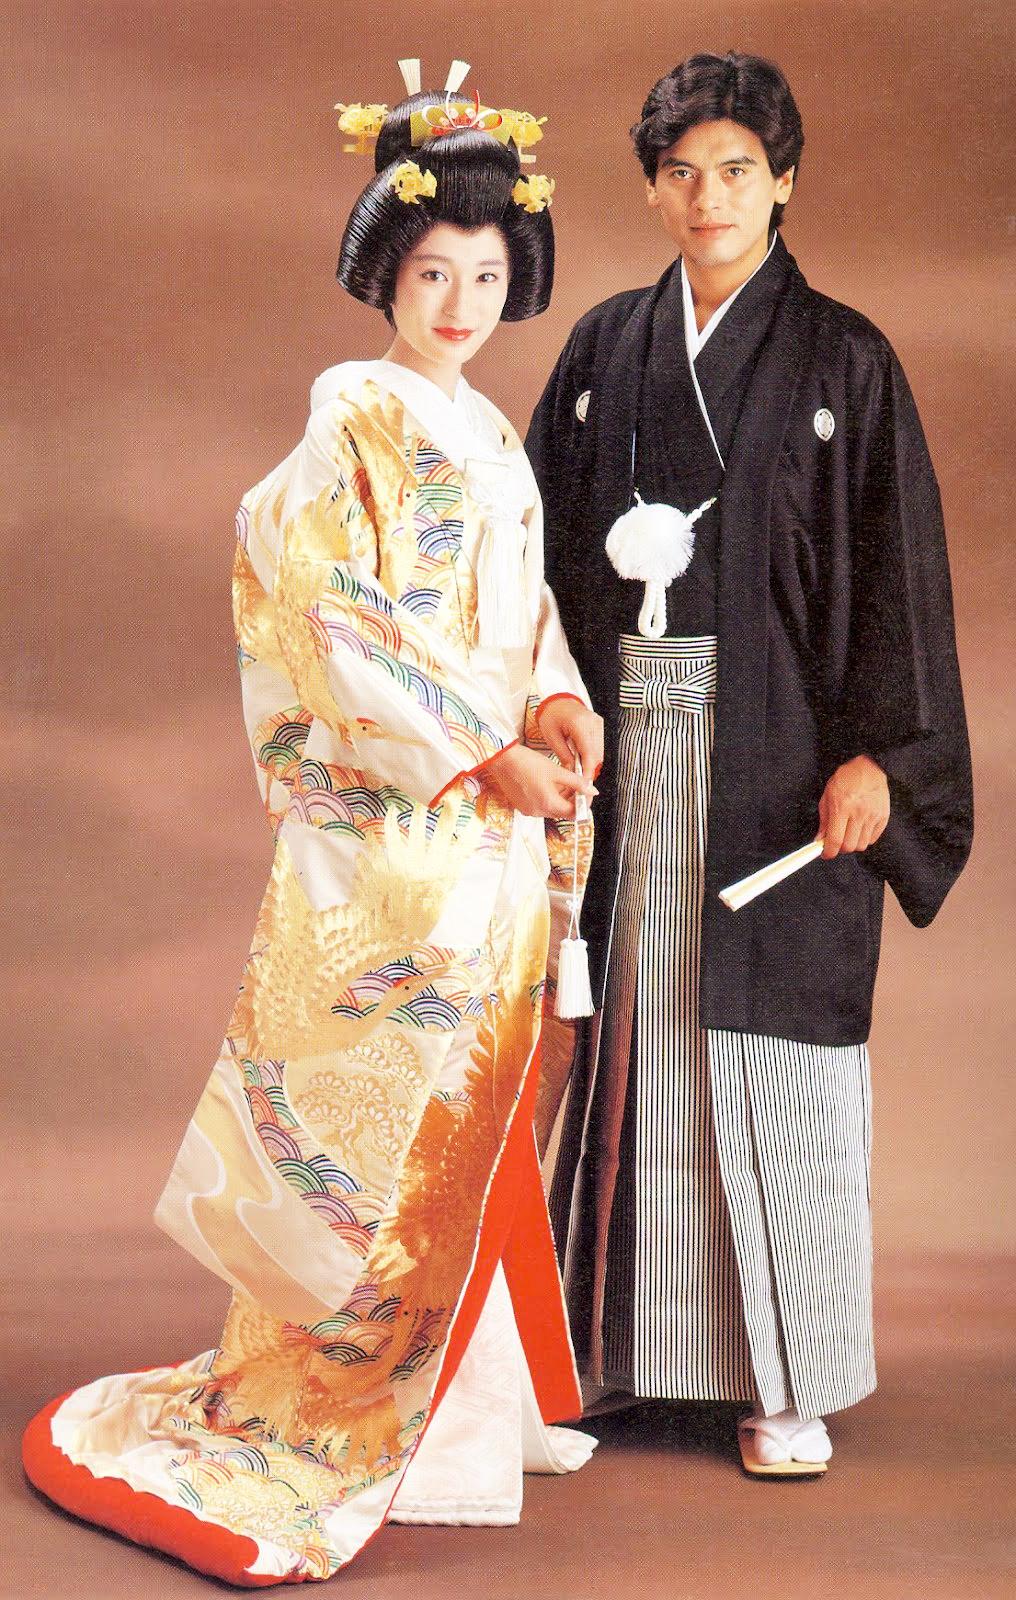 All About Japan: Pakaian Tradisional Jepang - Kimono